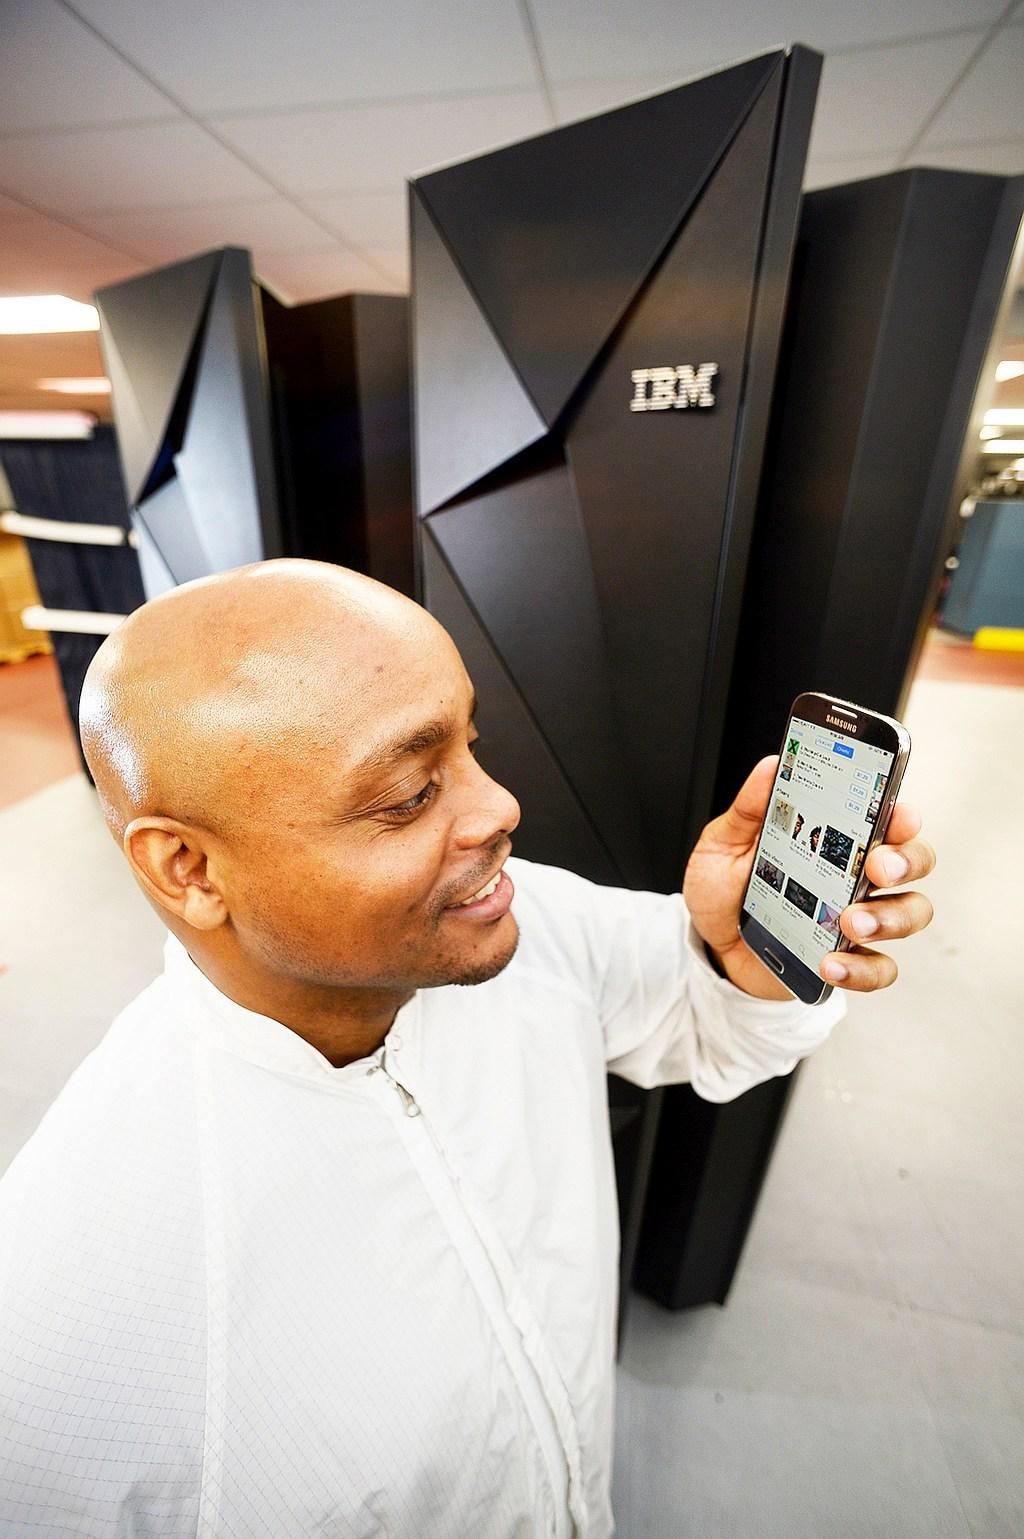 foto (c) ibmz13 mainframe transactions mobile economy